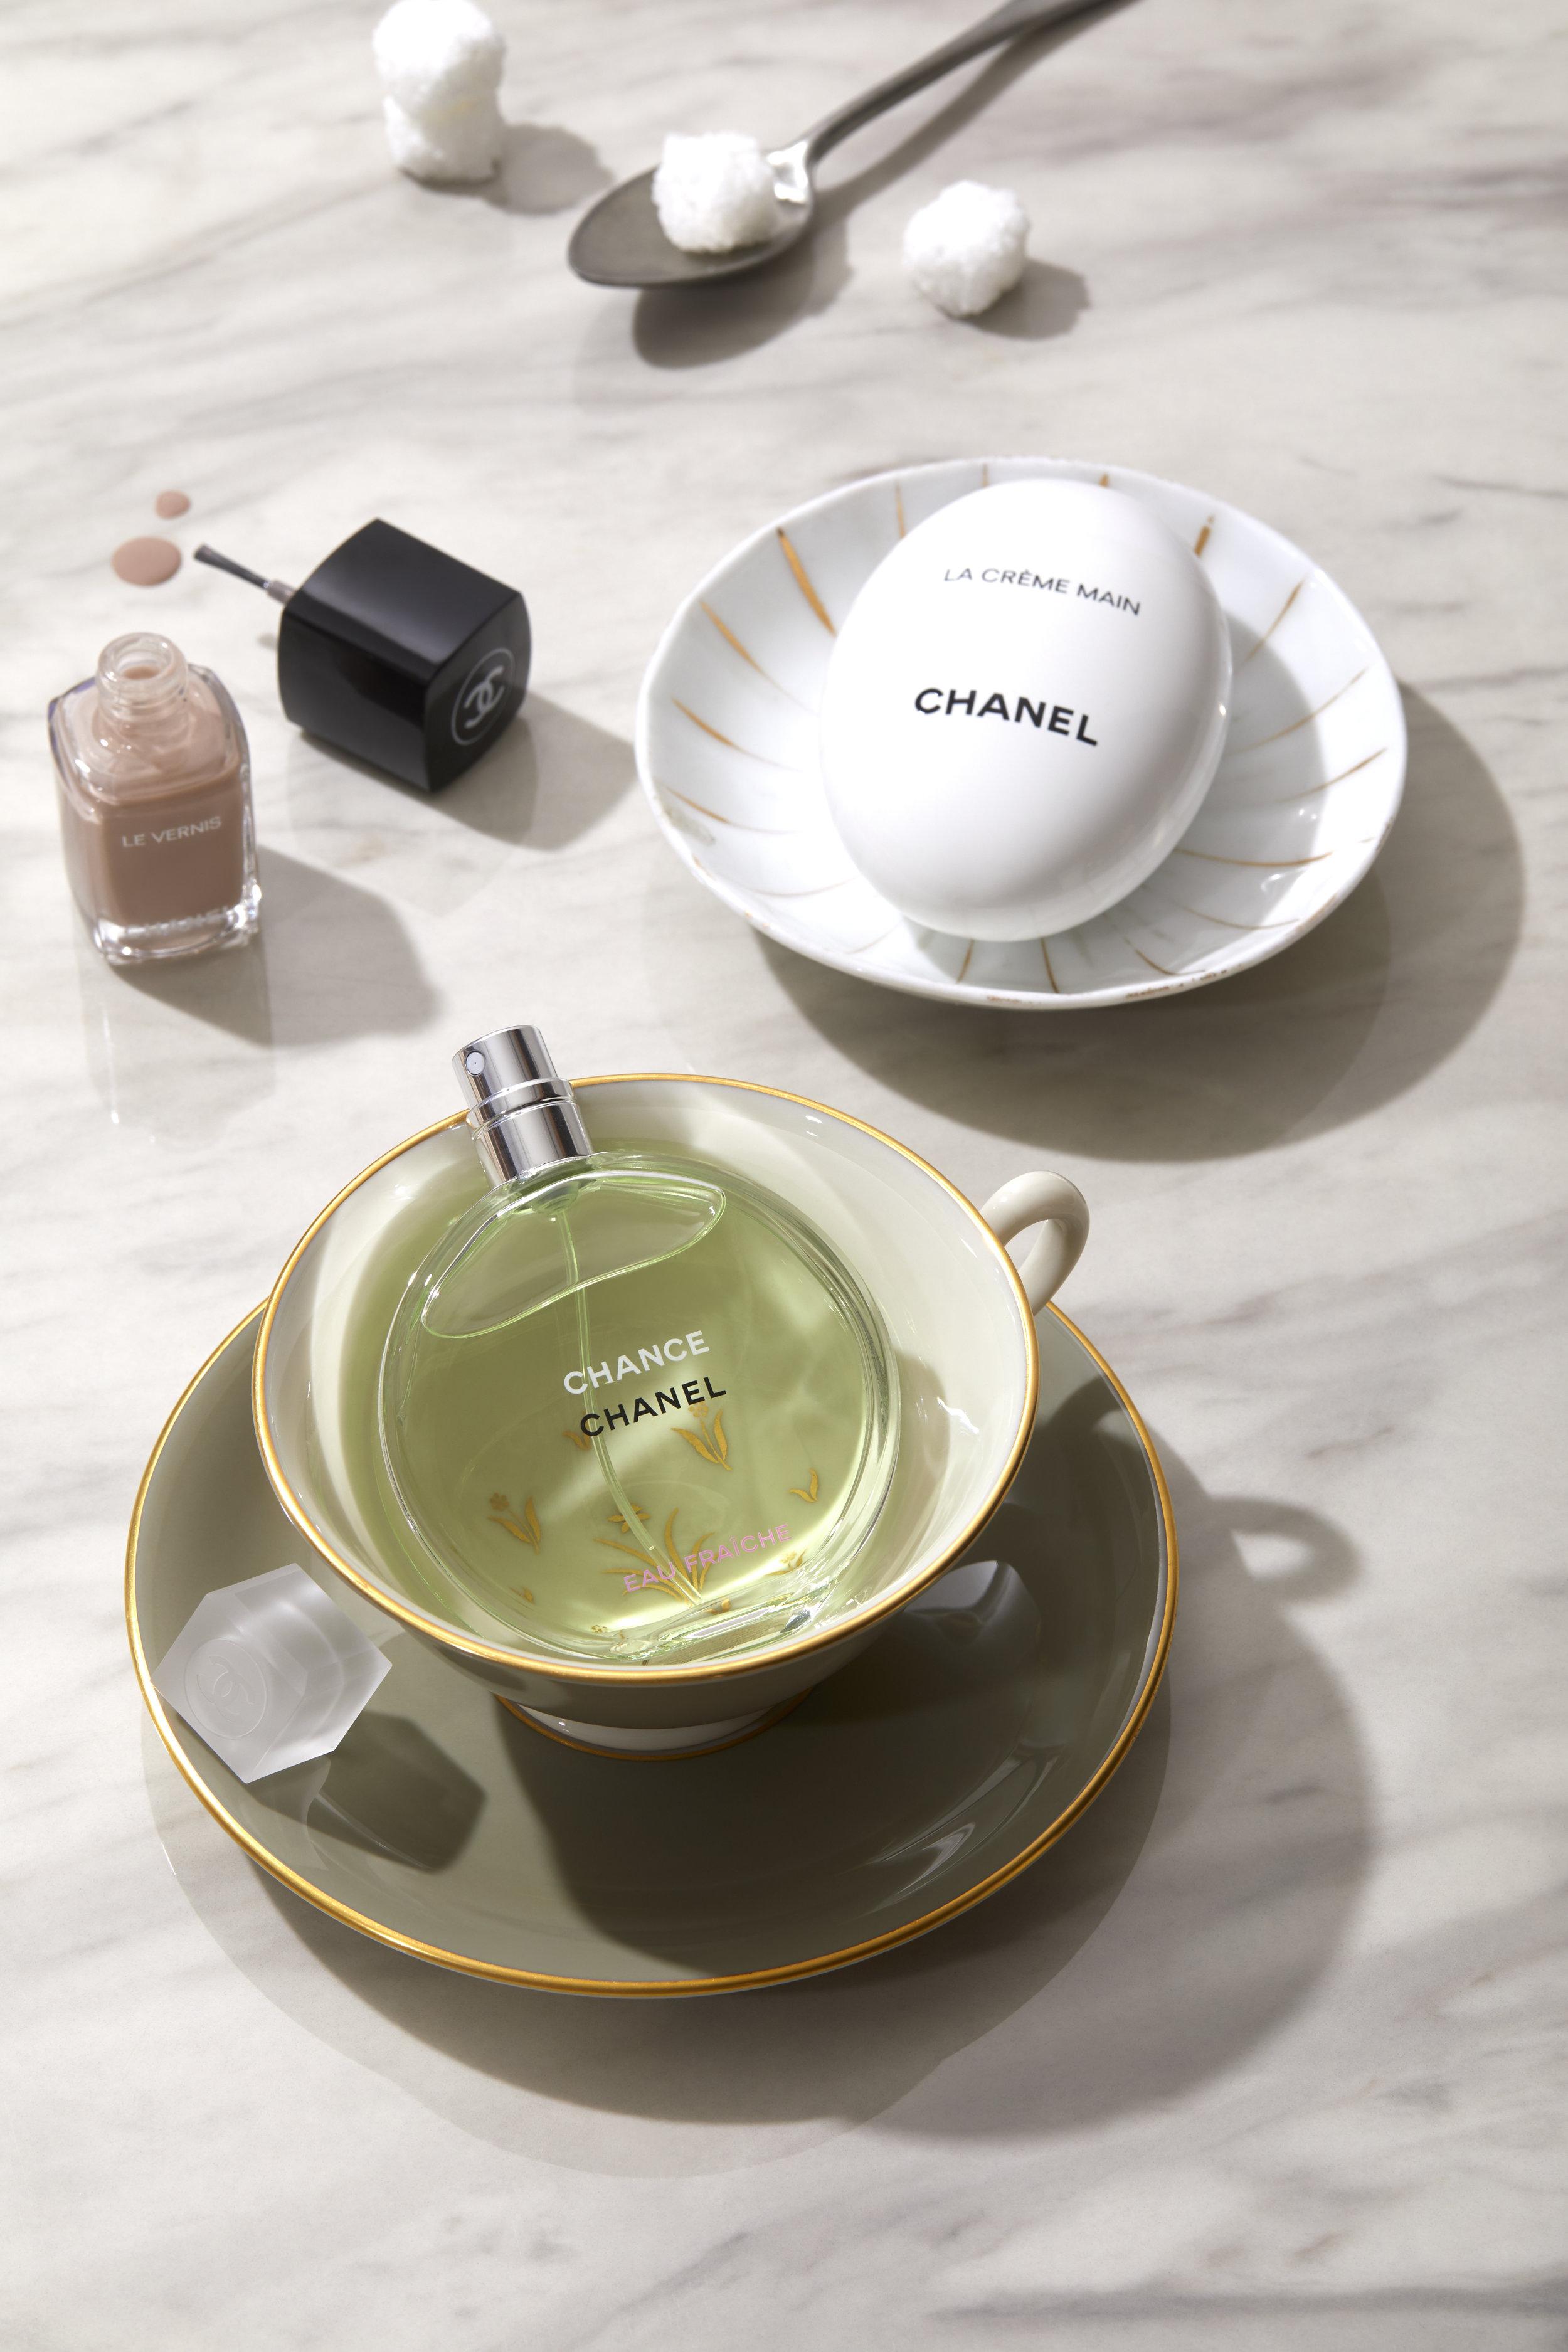 jeanette_perfume3751.jpg